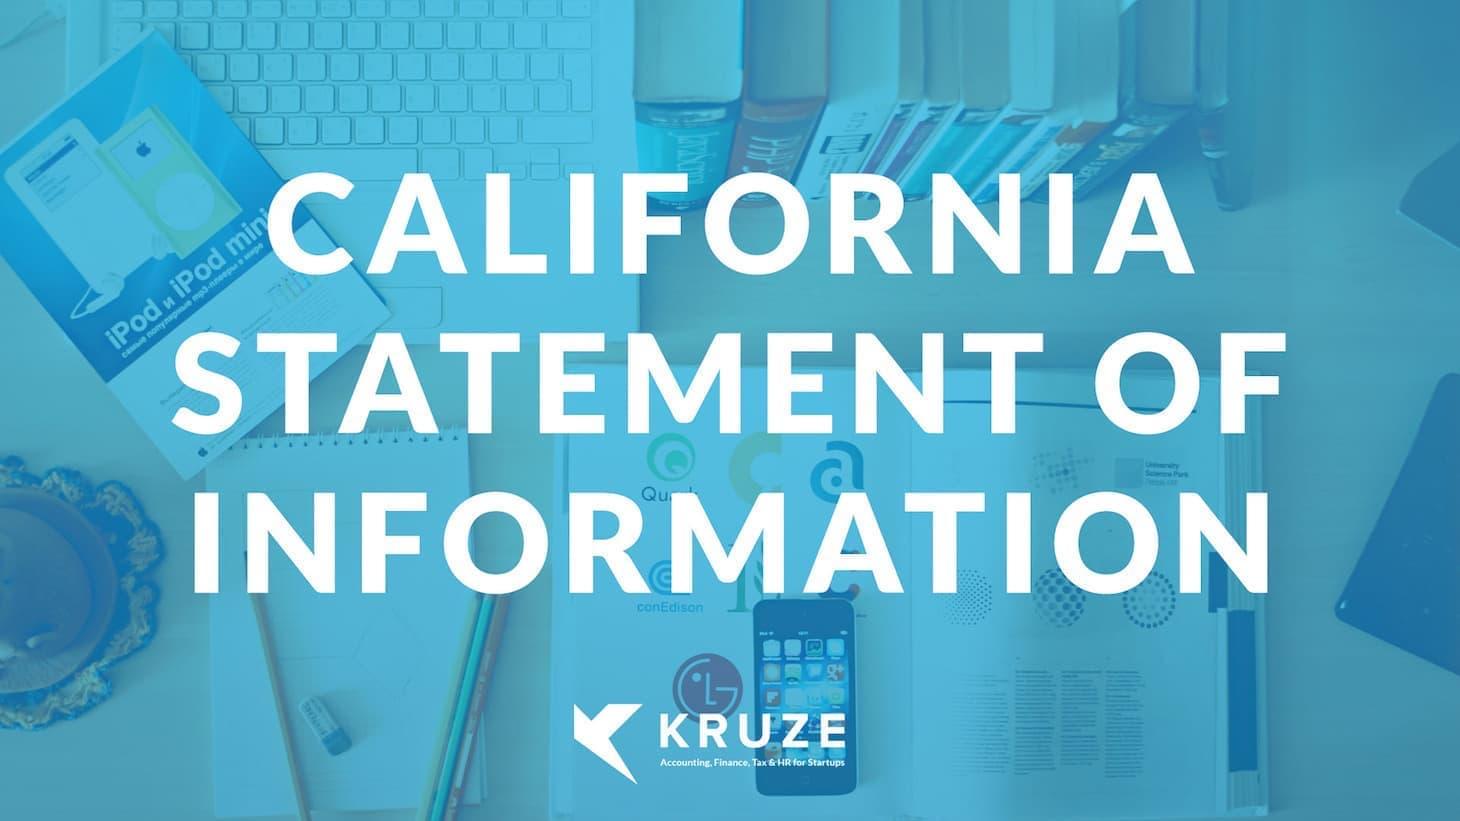 California Statement of Information